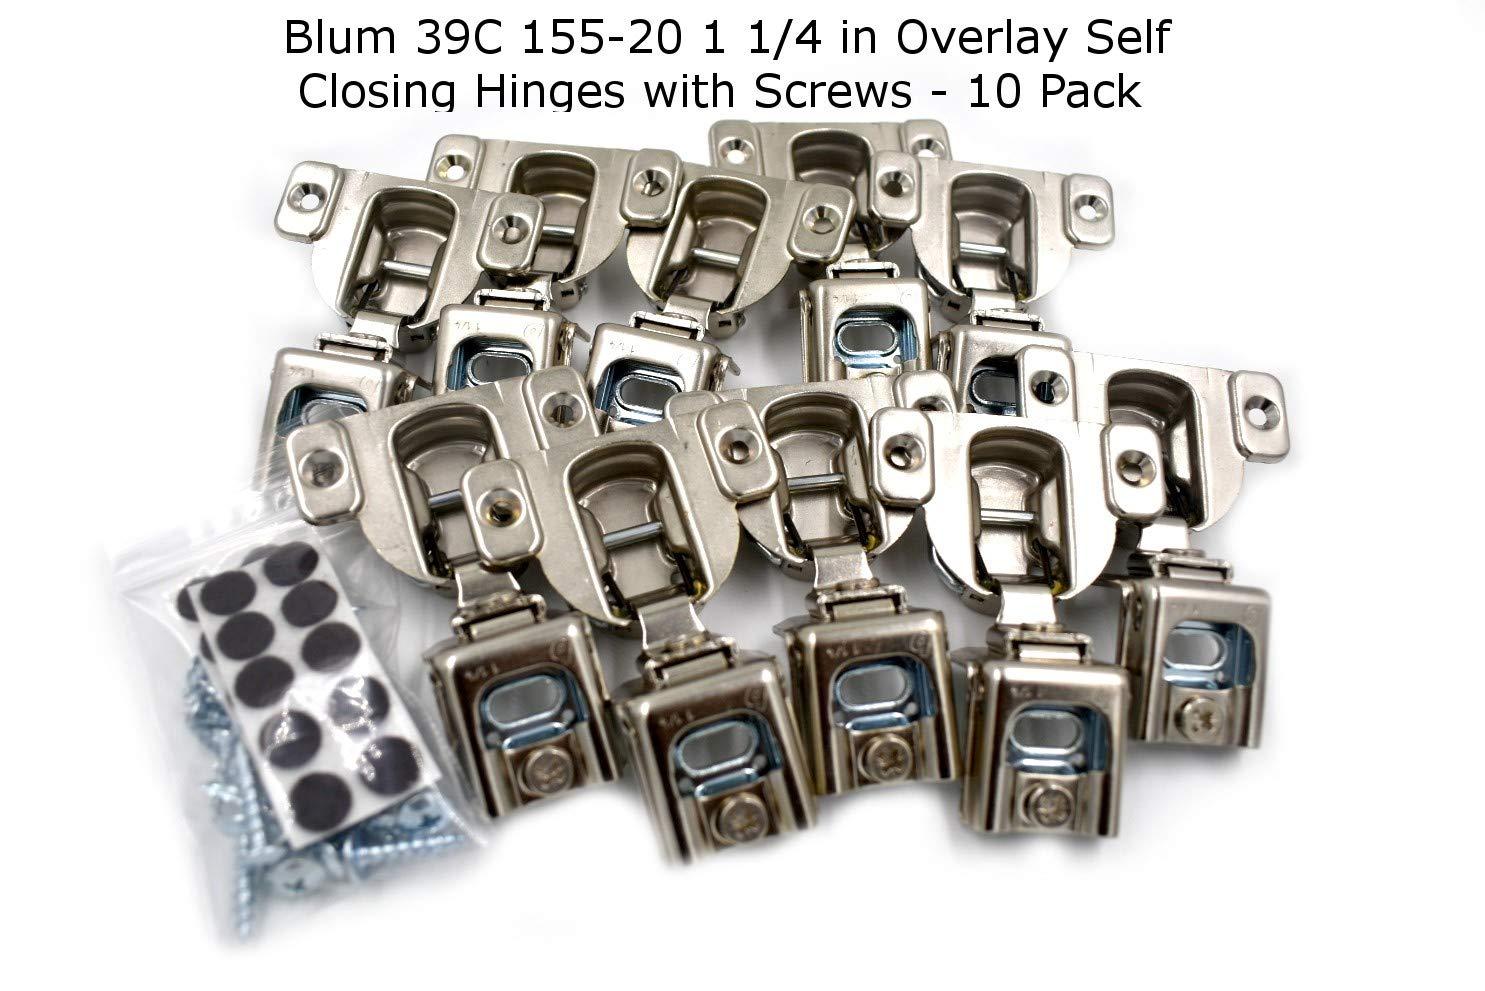 10 Pcs (5 Pairs) Blum 39C155-20 1/4 in Overlay Hinge (self Closing) Screw on Type with Screws